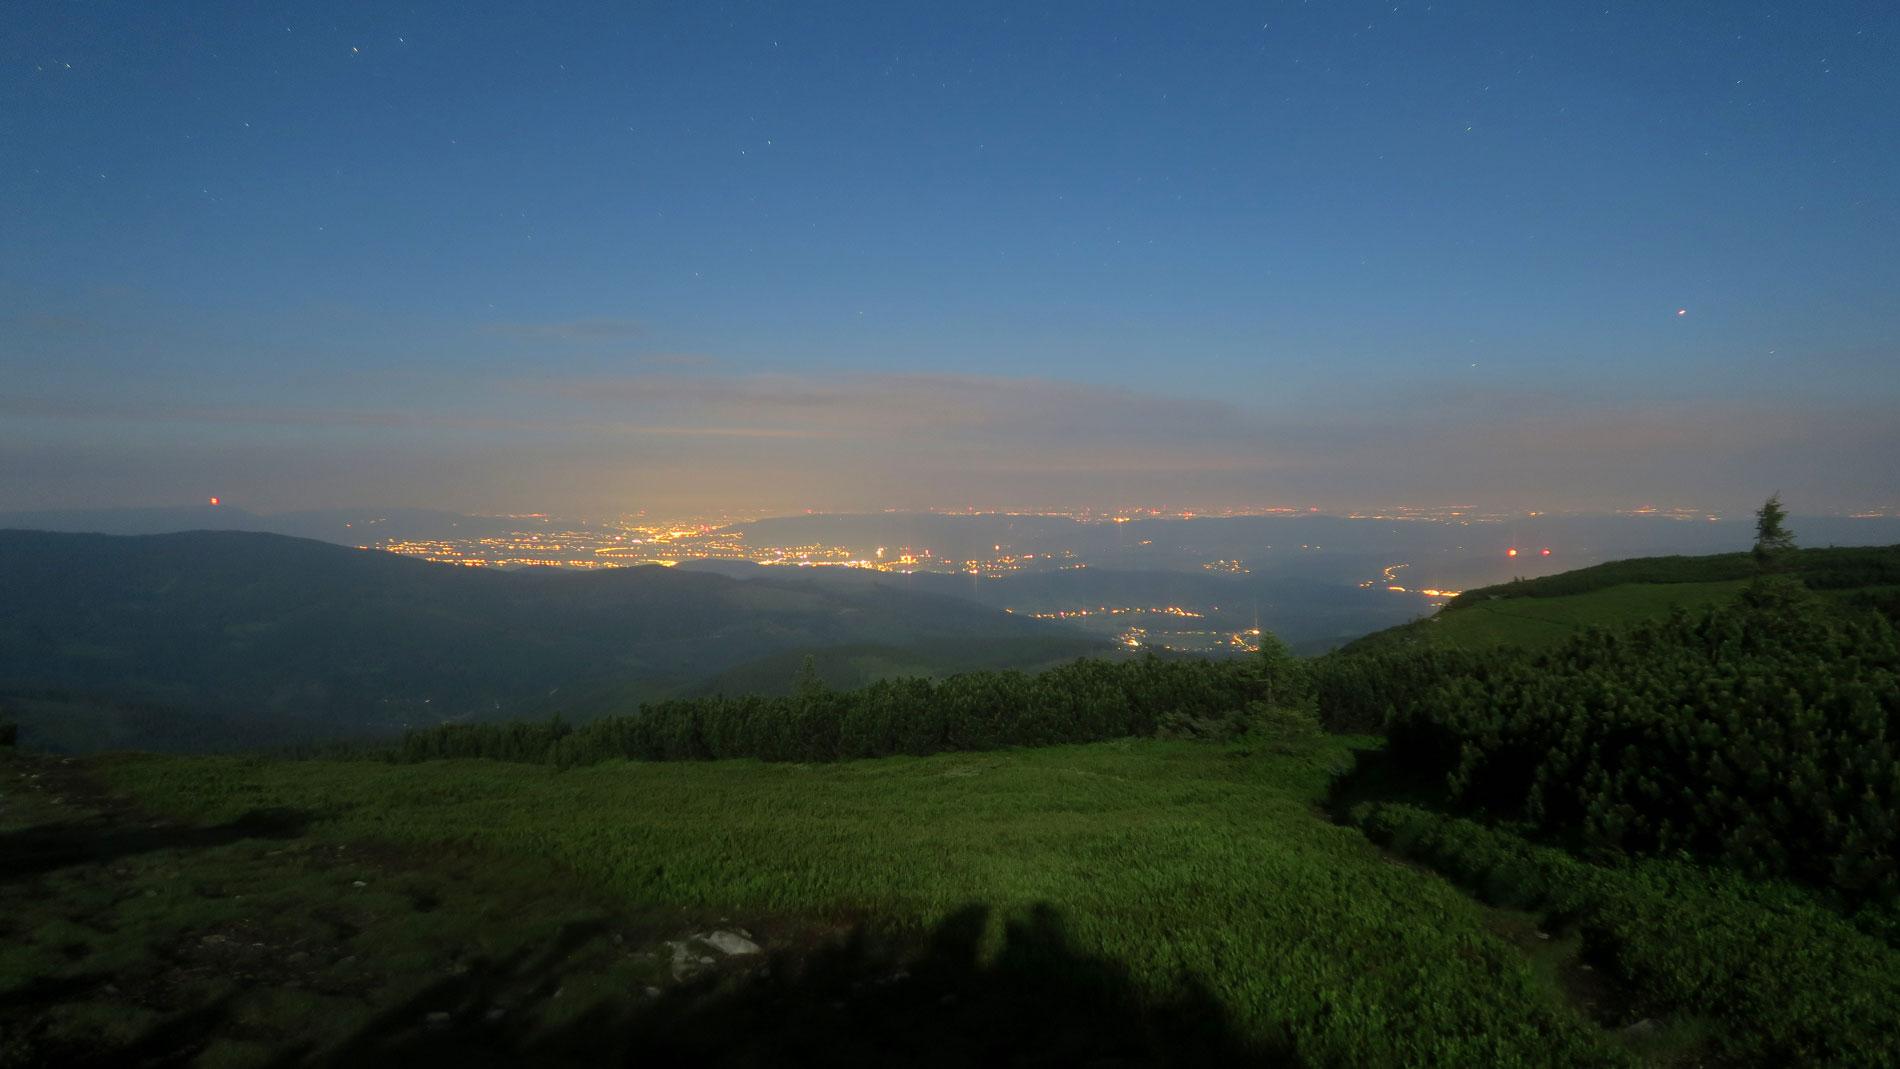 Oslava letného slnovratu na Pilsku